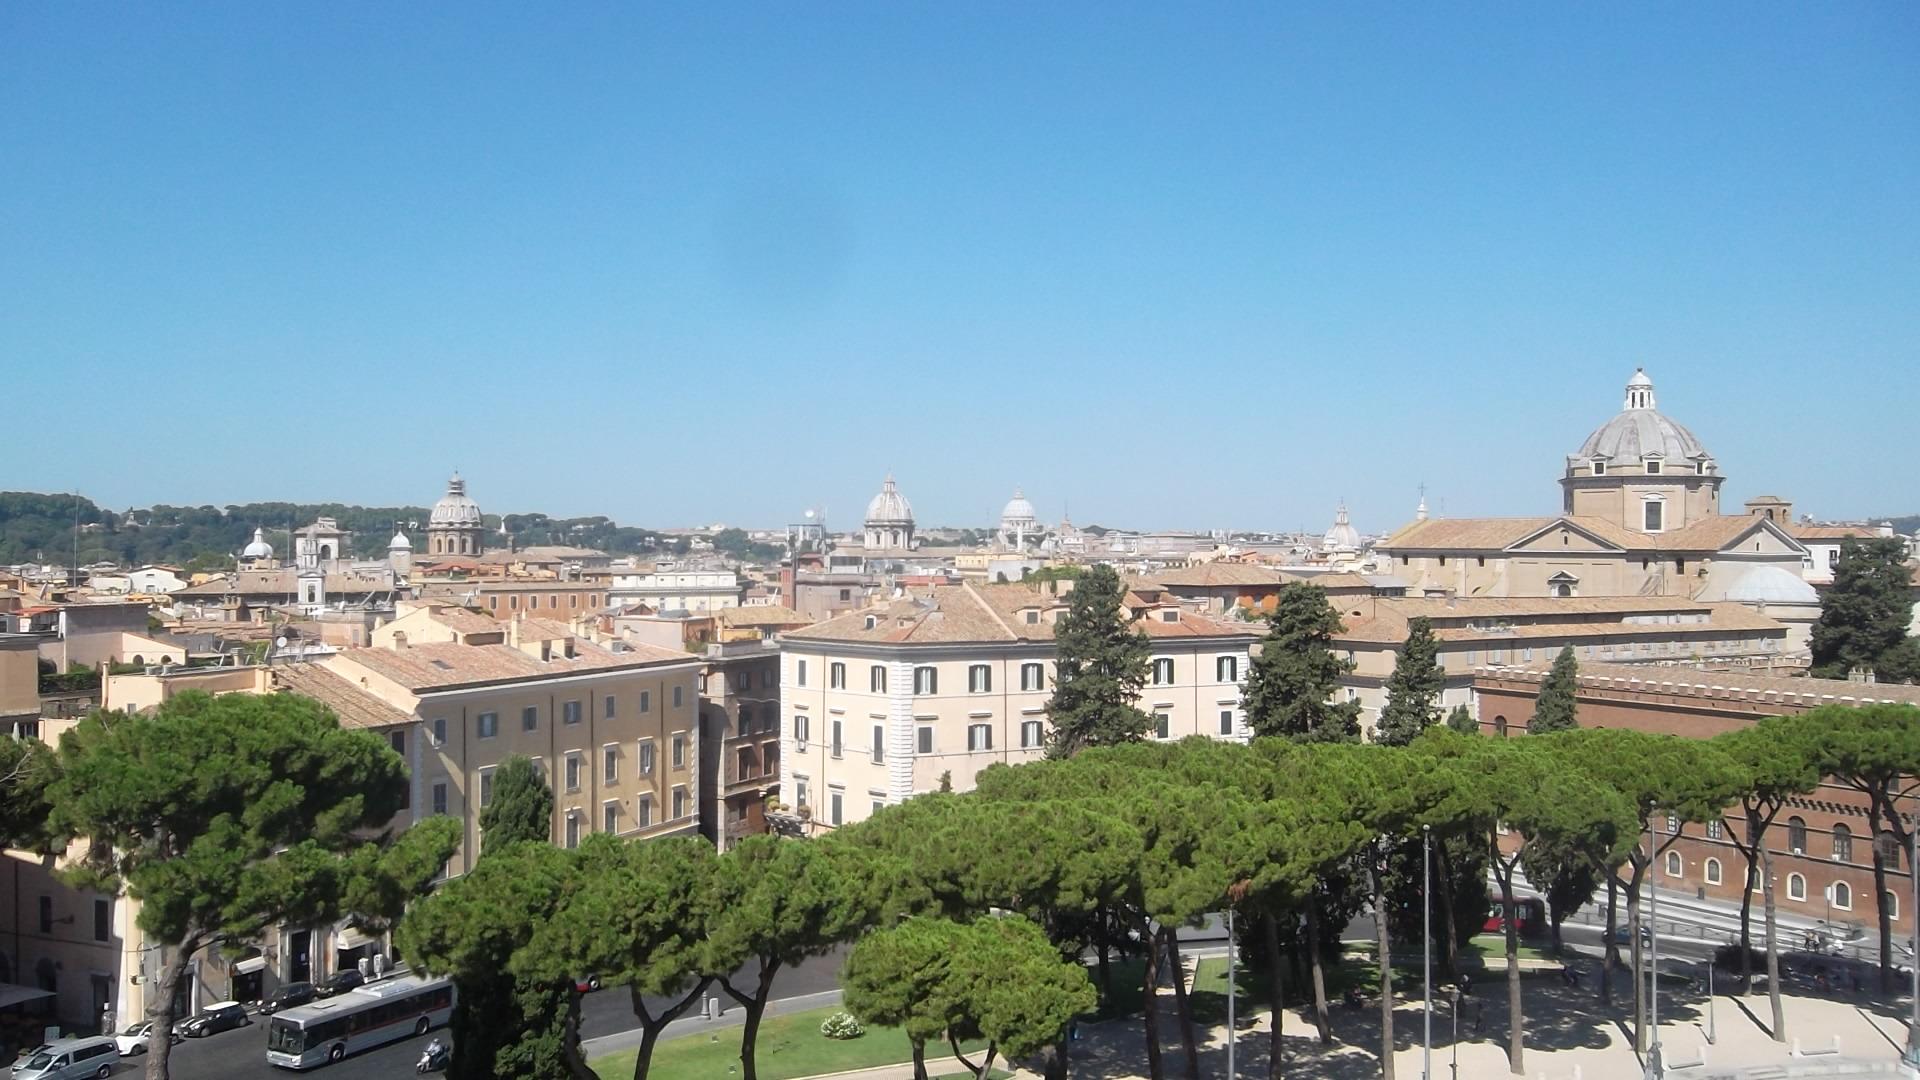 roma-mon-emanuele-vittorio-view-of-city-p-venezia-aug13